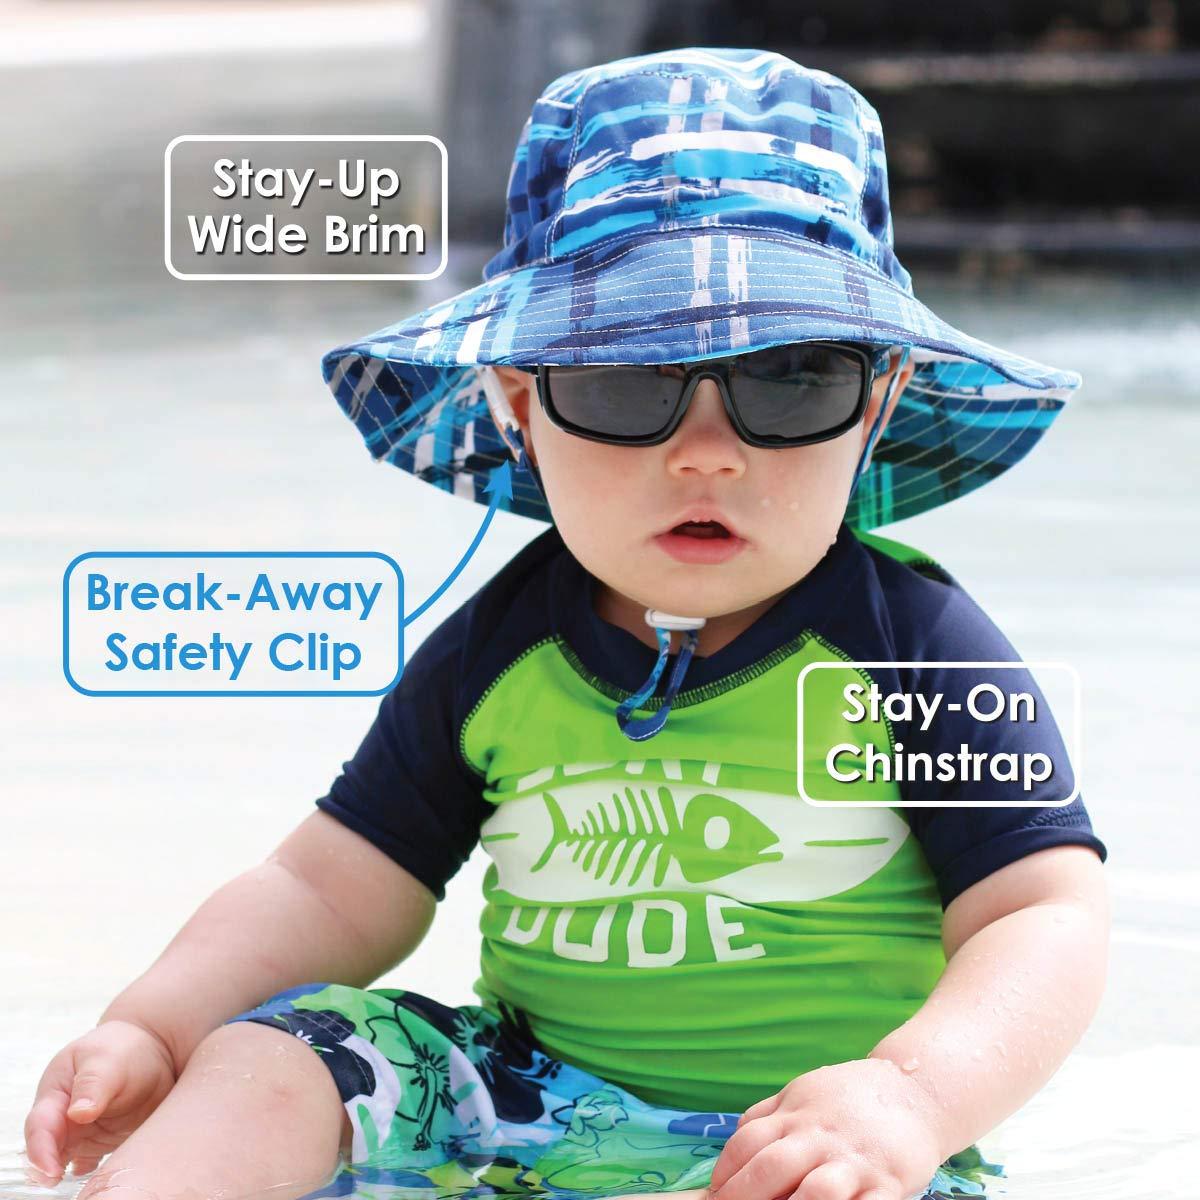 aa954198a4a70 Amazon.com  JAN   JUL Girls Quick-Dry Sun-Hat 50+UPF Protection ...